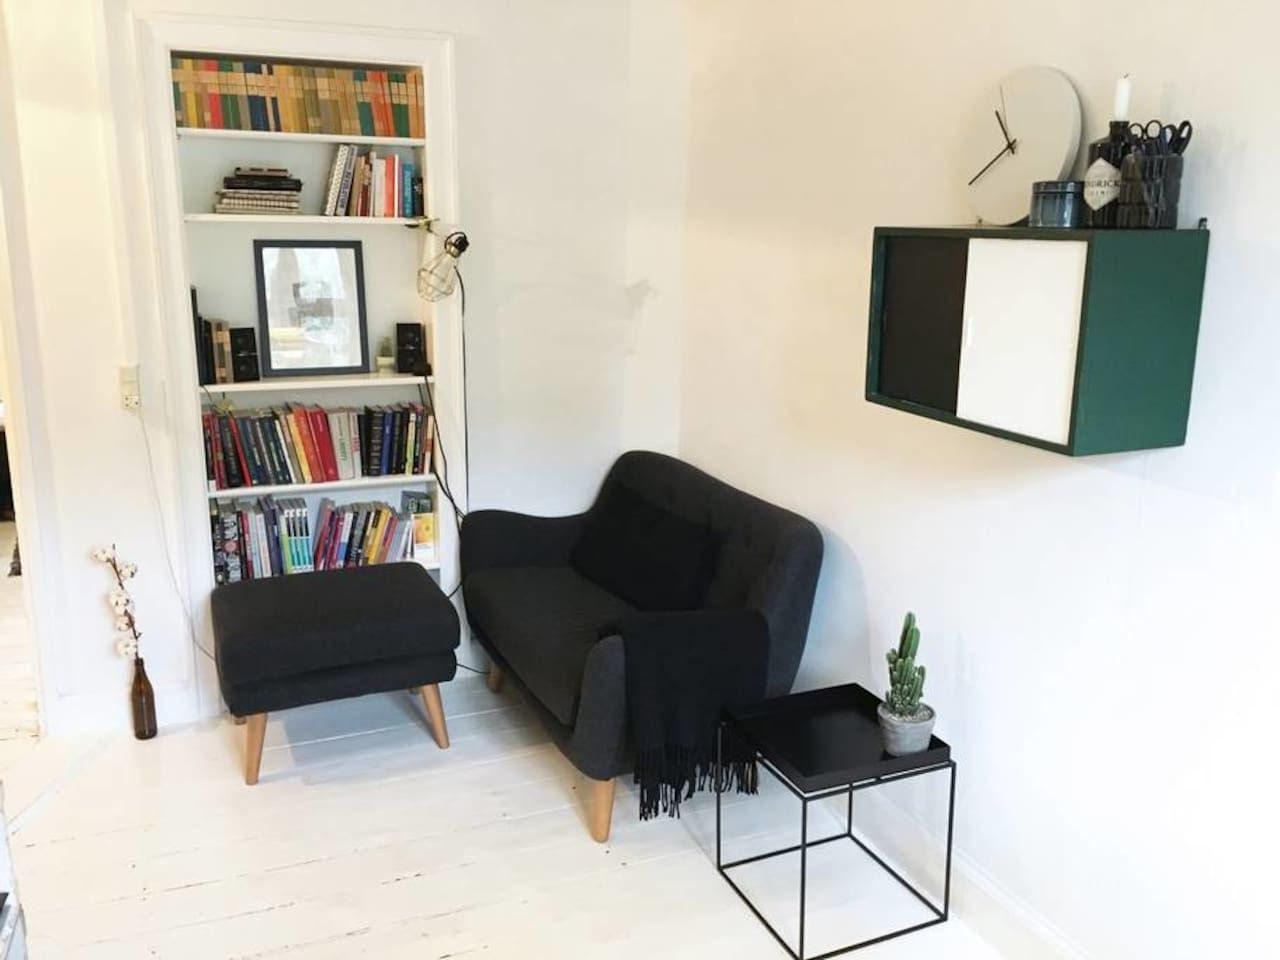 Cozy apartment in trendy neighborhood - 코펜하겐(Copenhagen)의 아파트에서 살아보기